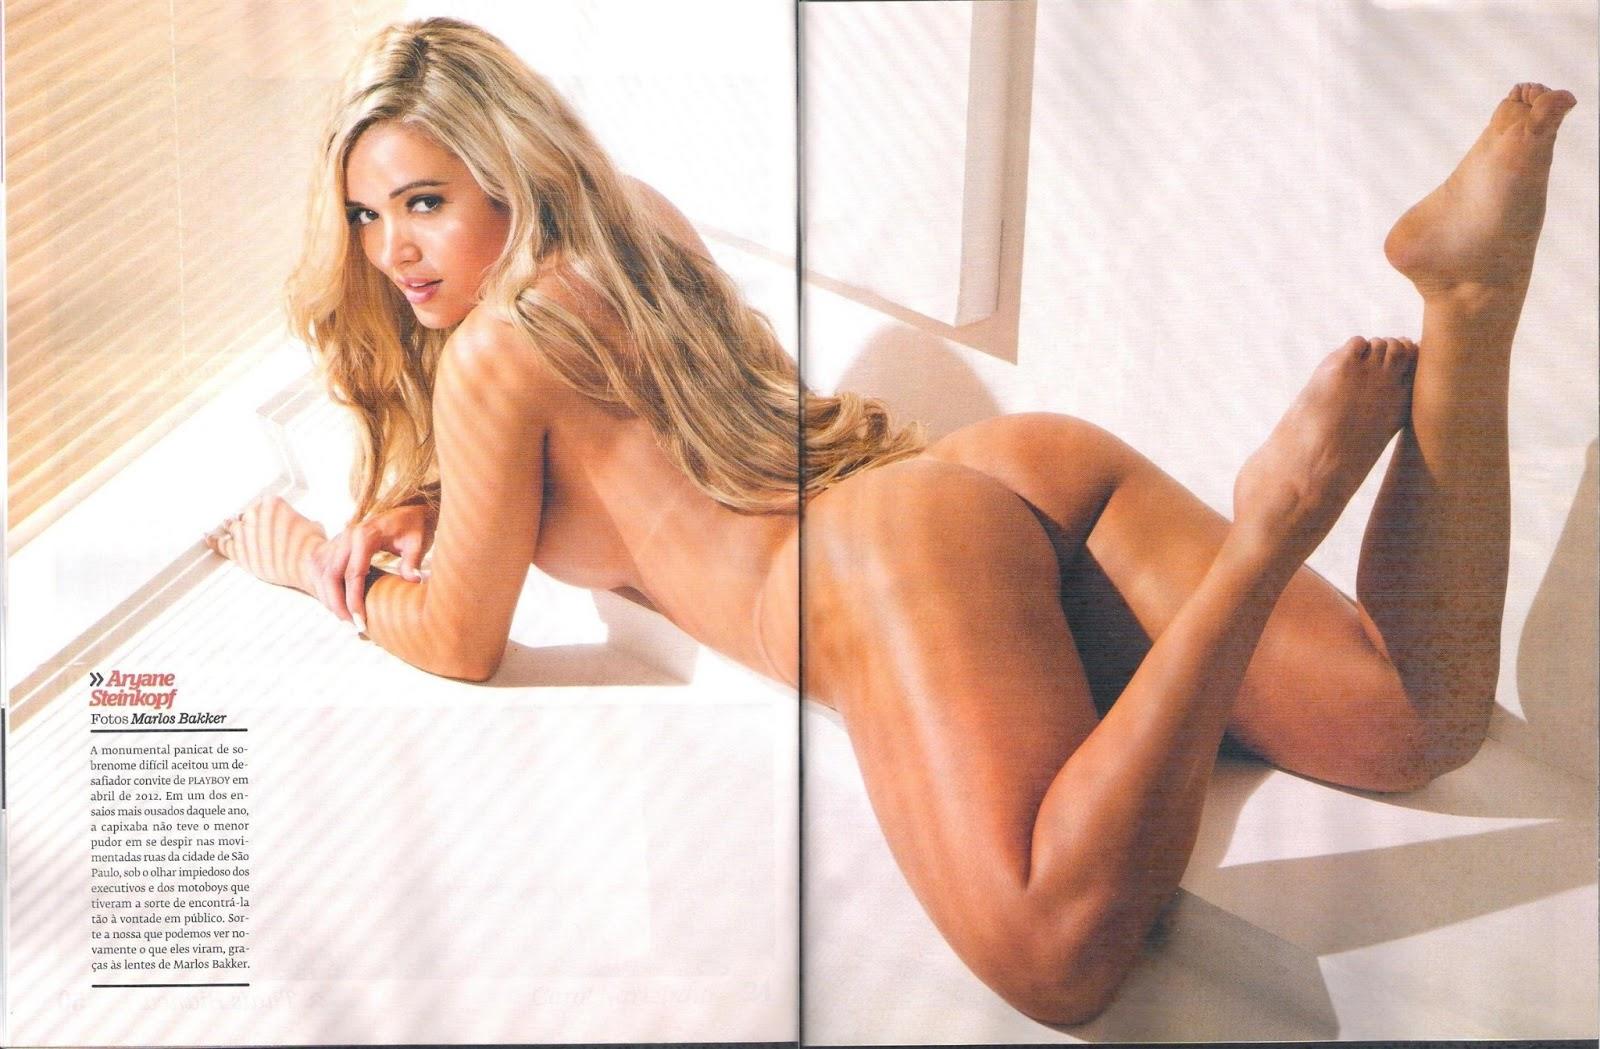 Juliana Salimeni Nicole Bahls E Thais Bianca Em Fotos In Ditas